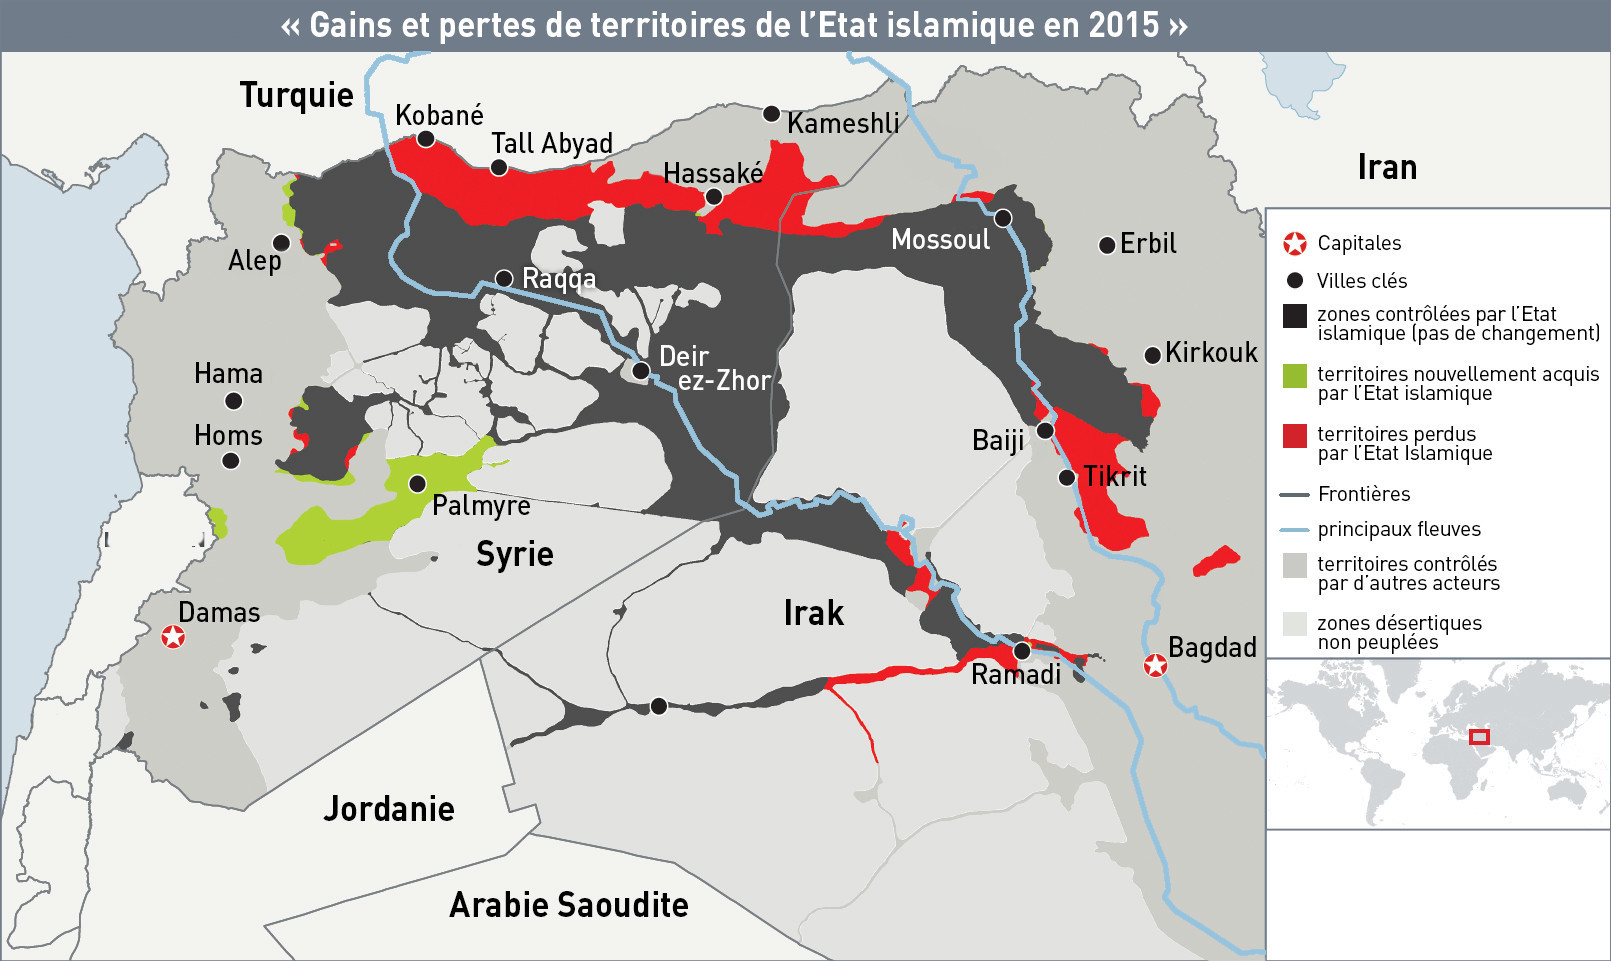 Gains et pertes de territoires de l'Etat Islamique en 2015